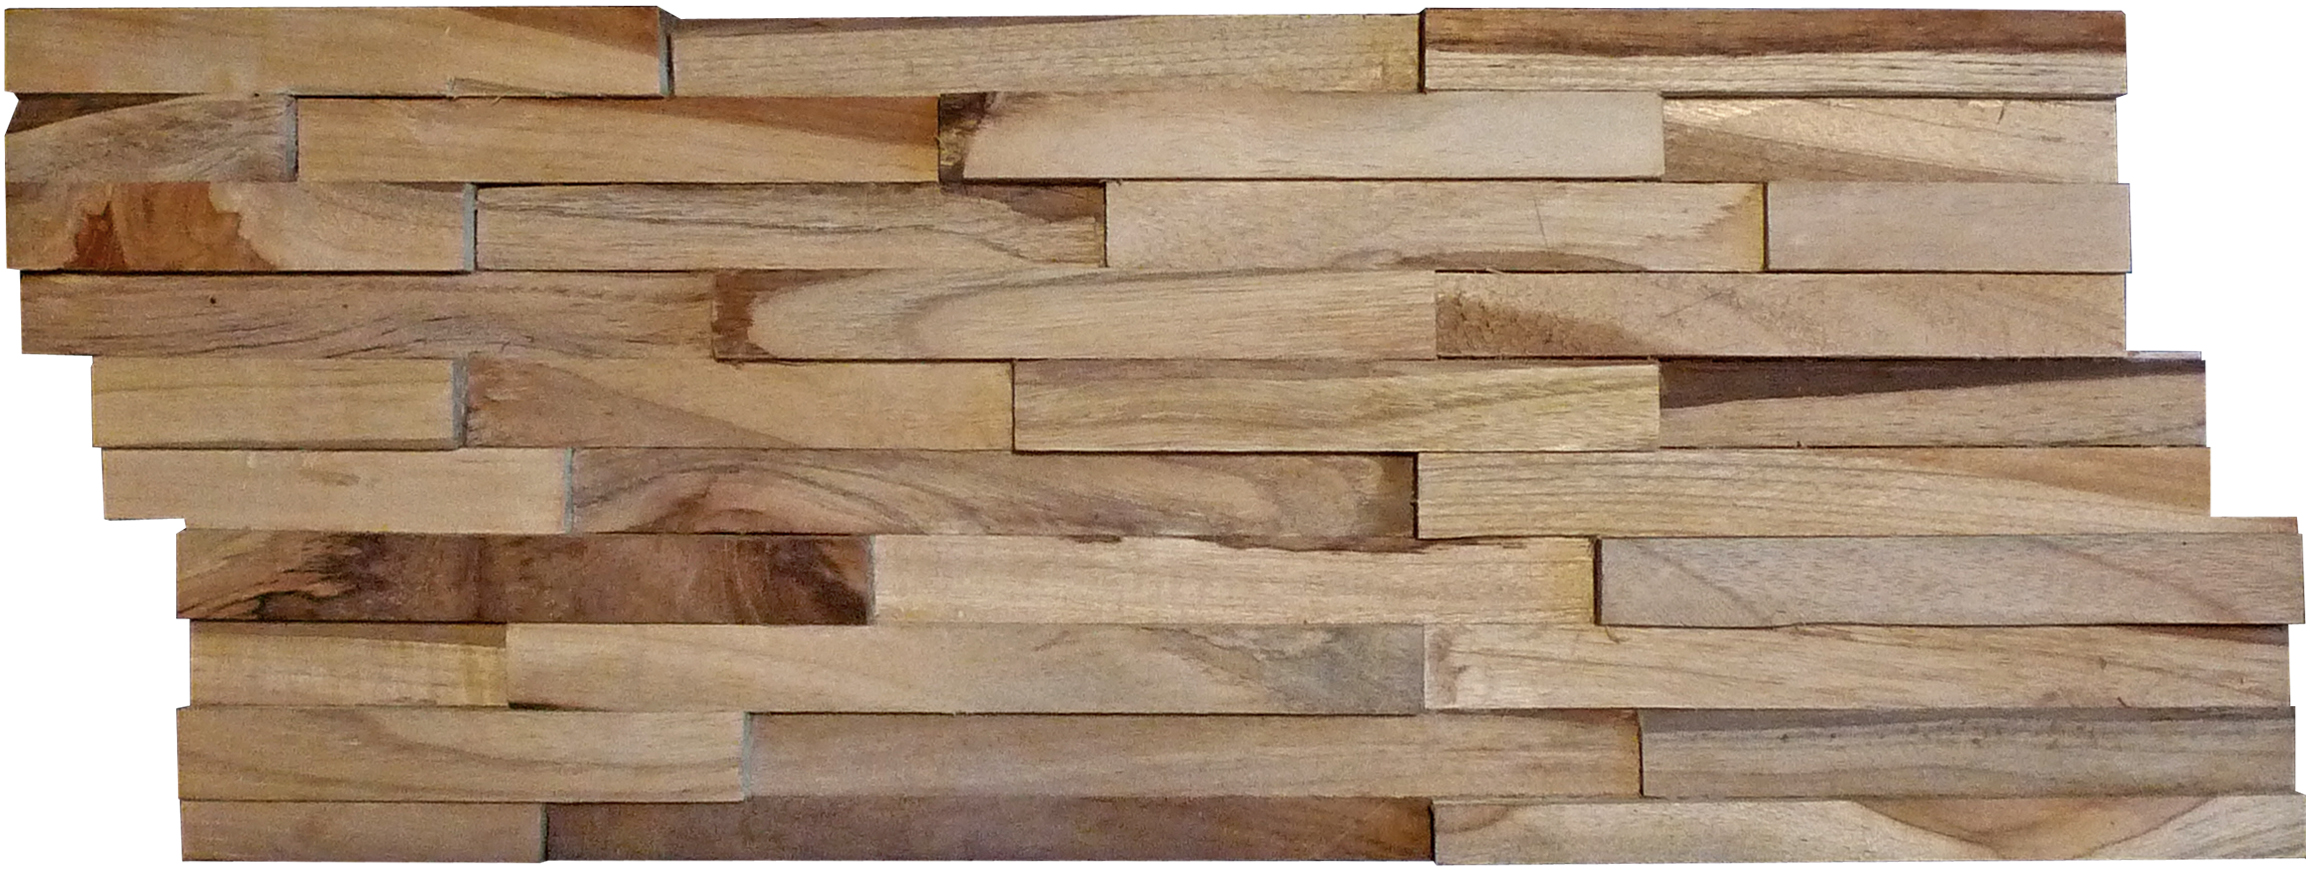 nieuwe trend moderne versie van houten wandbekleding hornbach newsroom. Black Bedroom Furniture Sets. Home Design Ideas